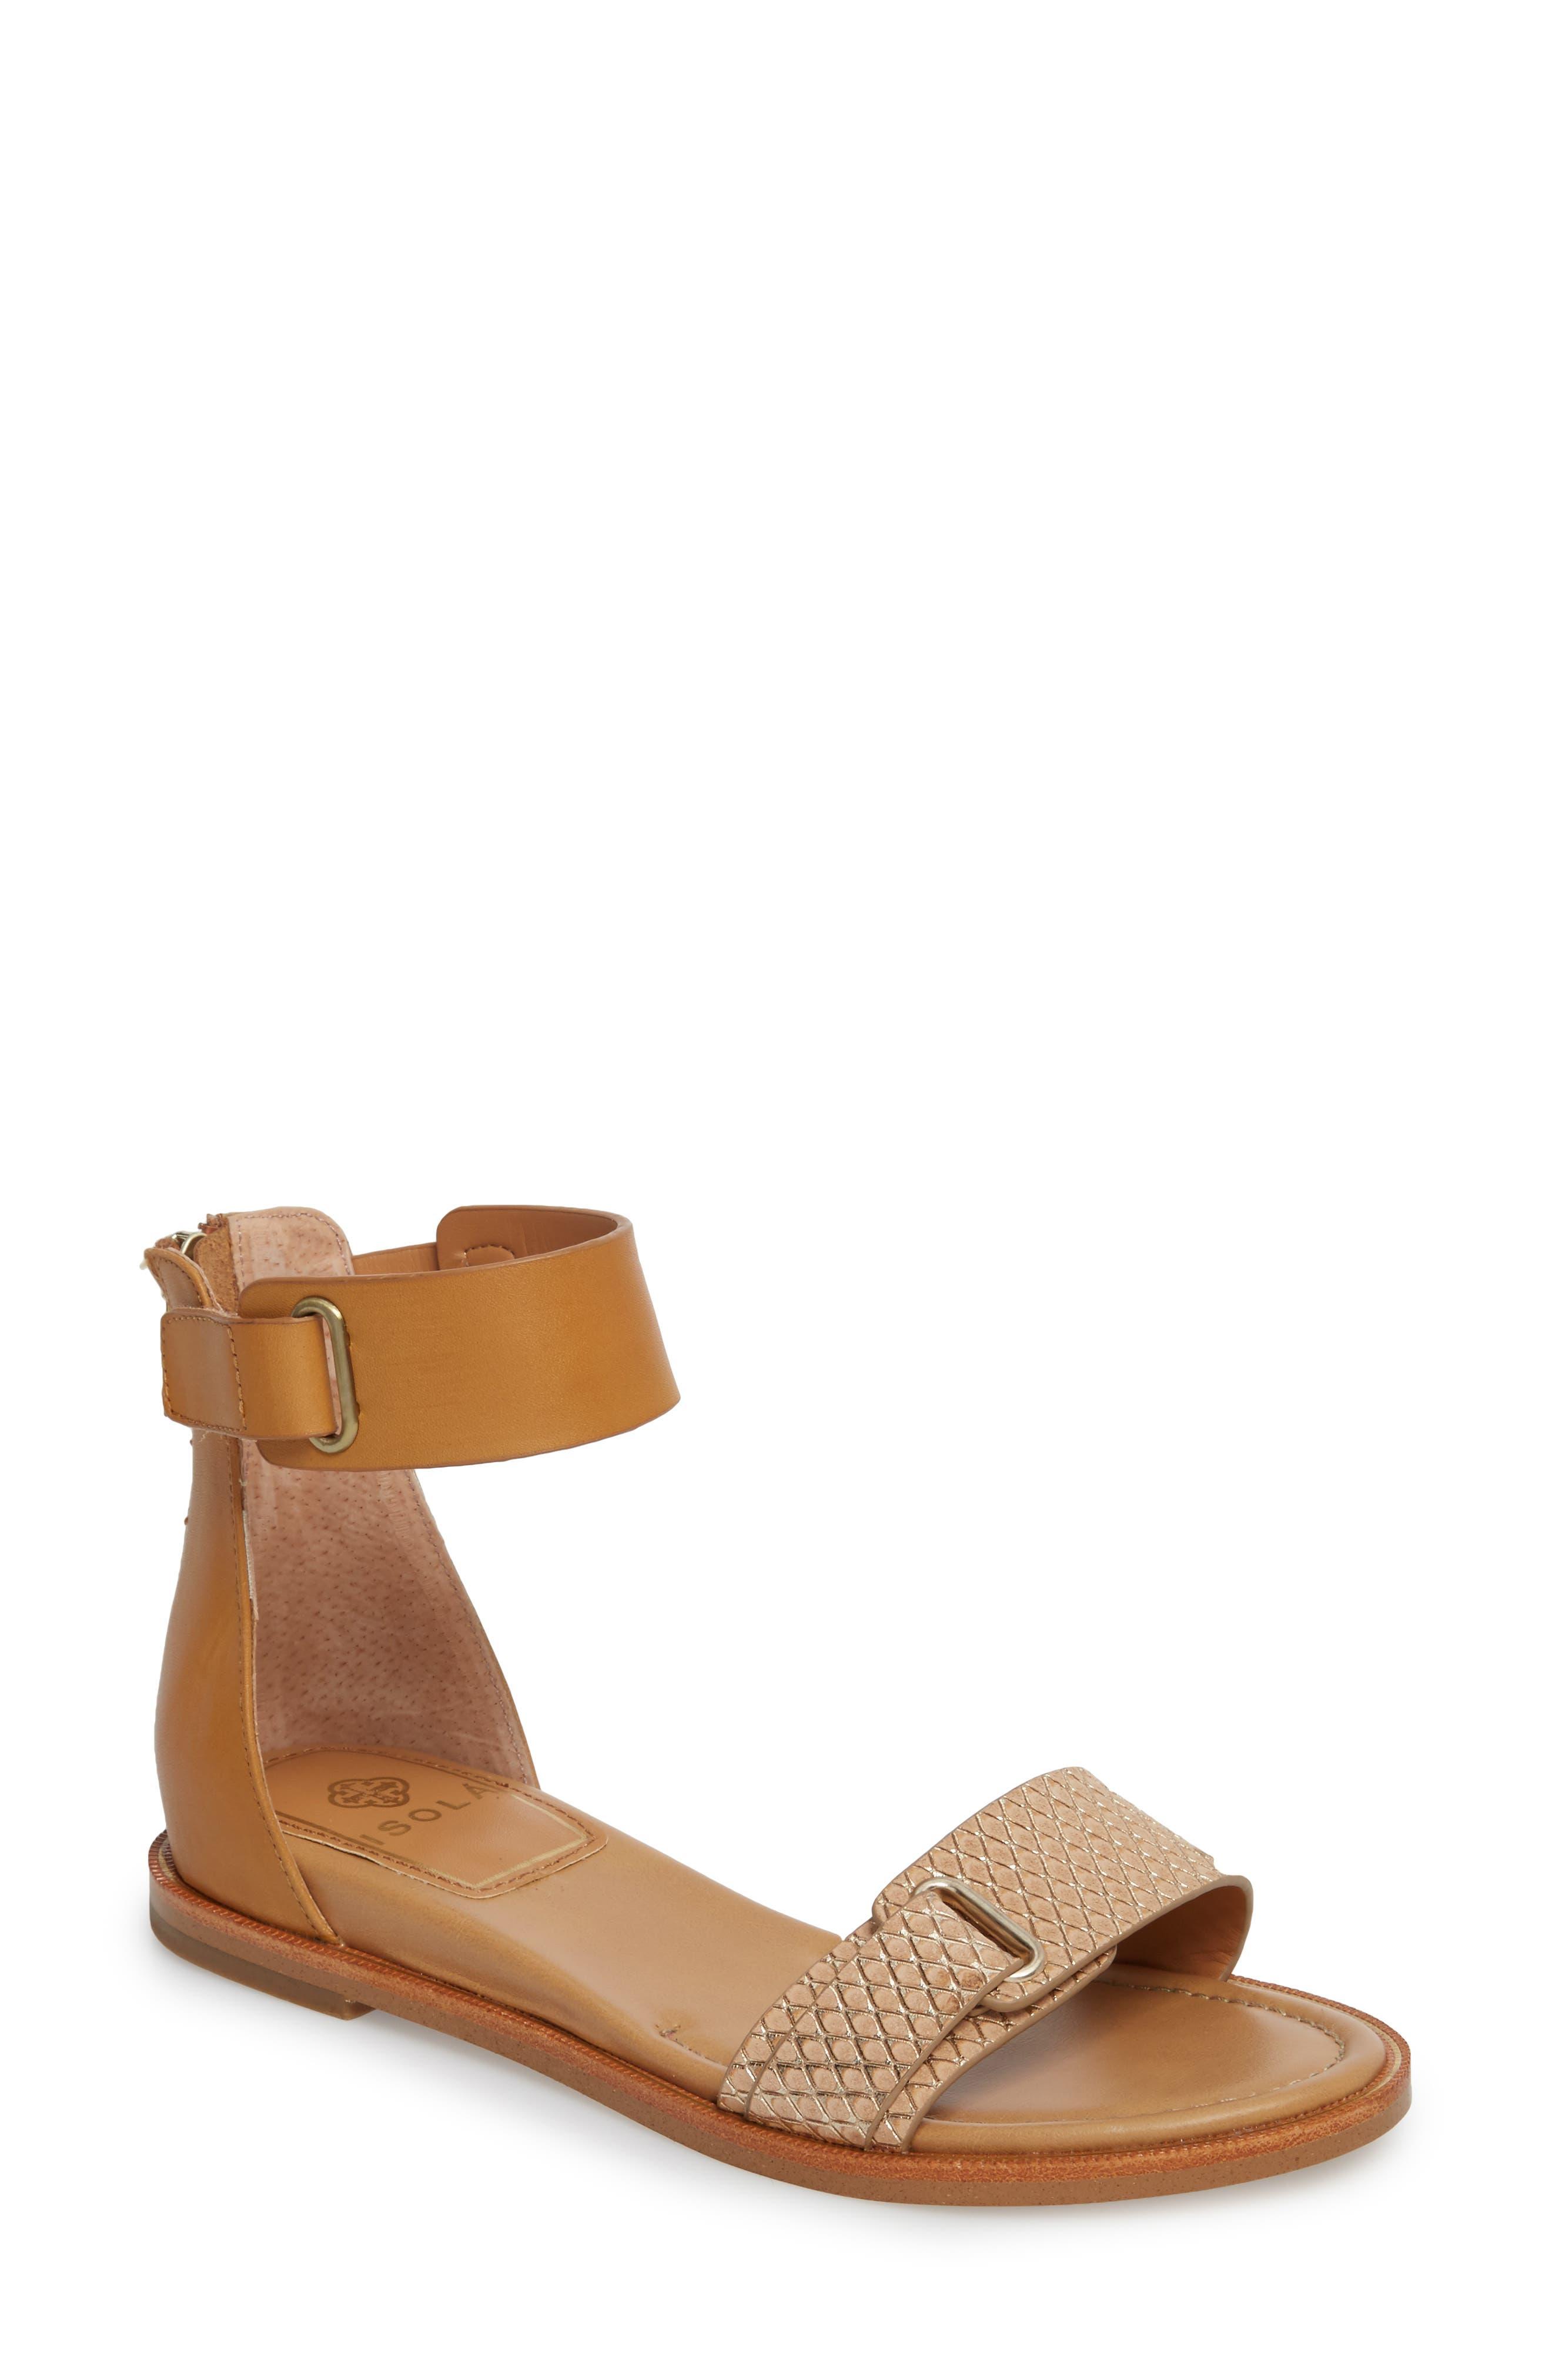 Savina Ankle Strap Sandal,                             Main thumbnail 1, color,                             Gold/ Desert Sand Leather